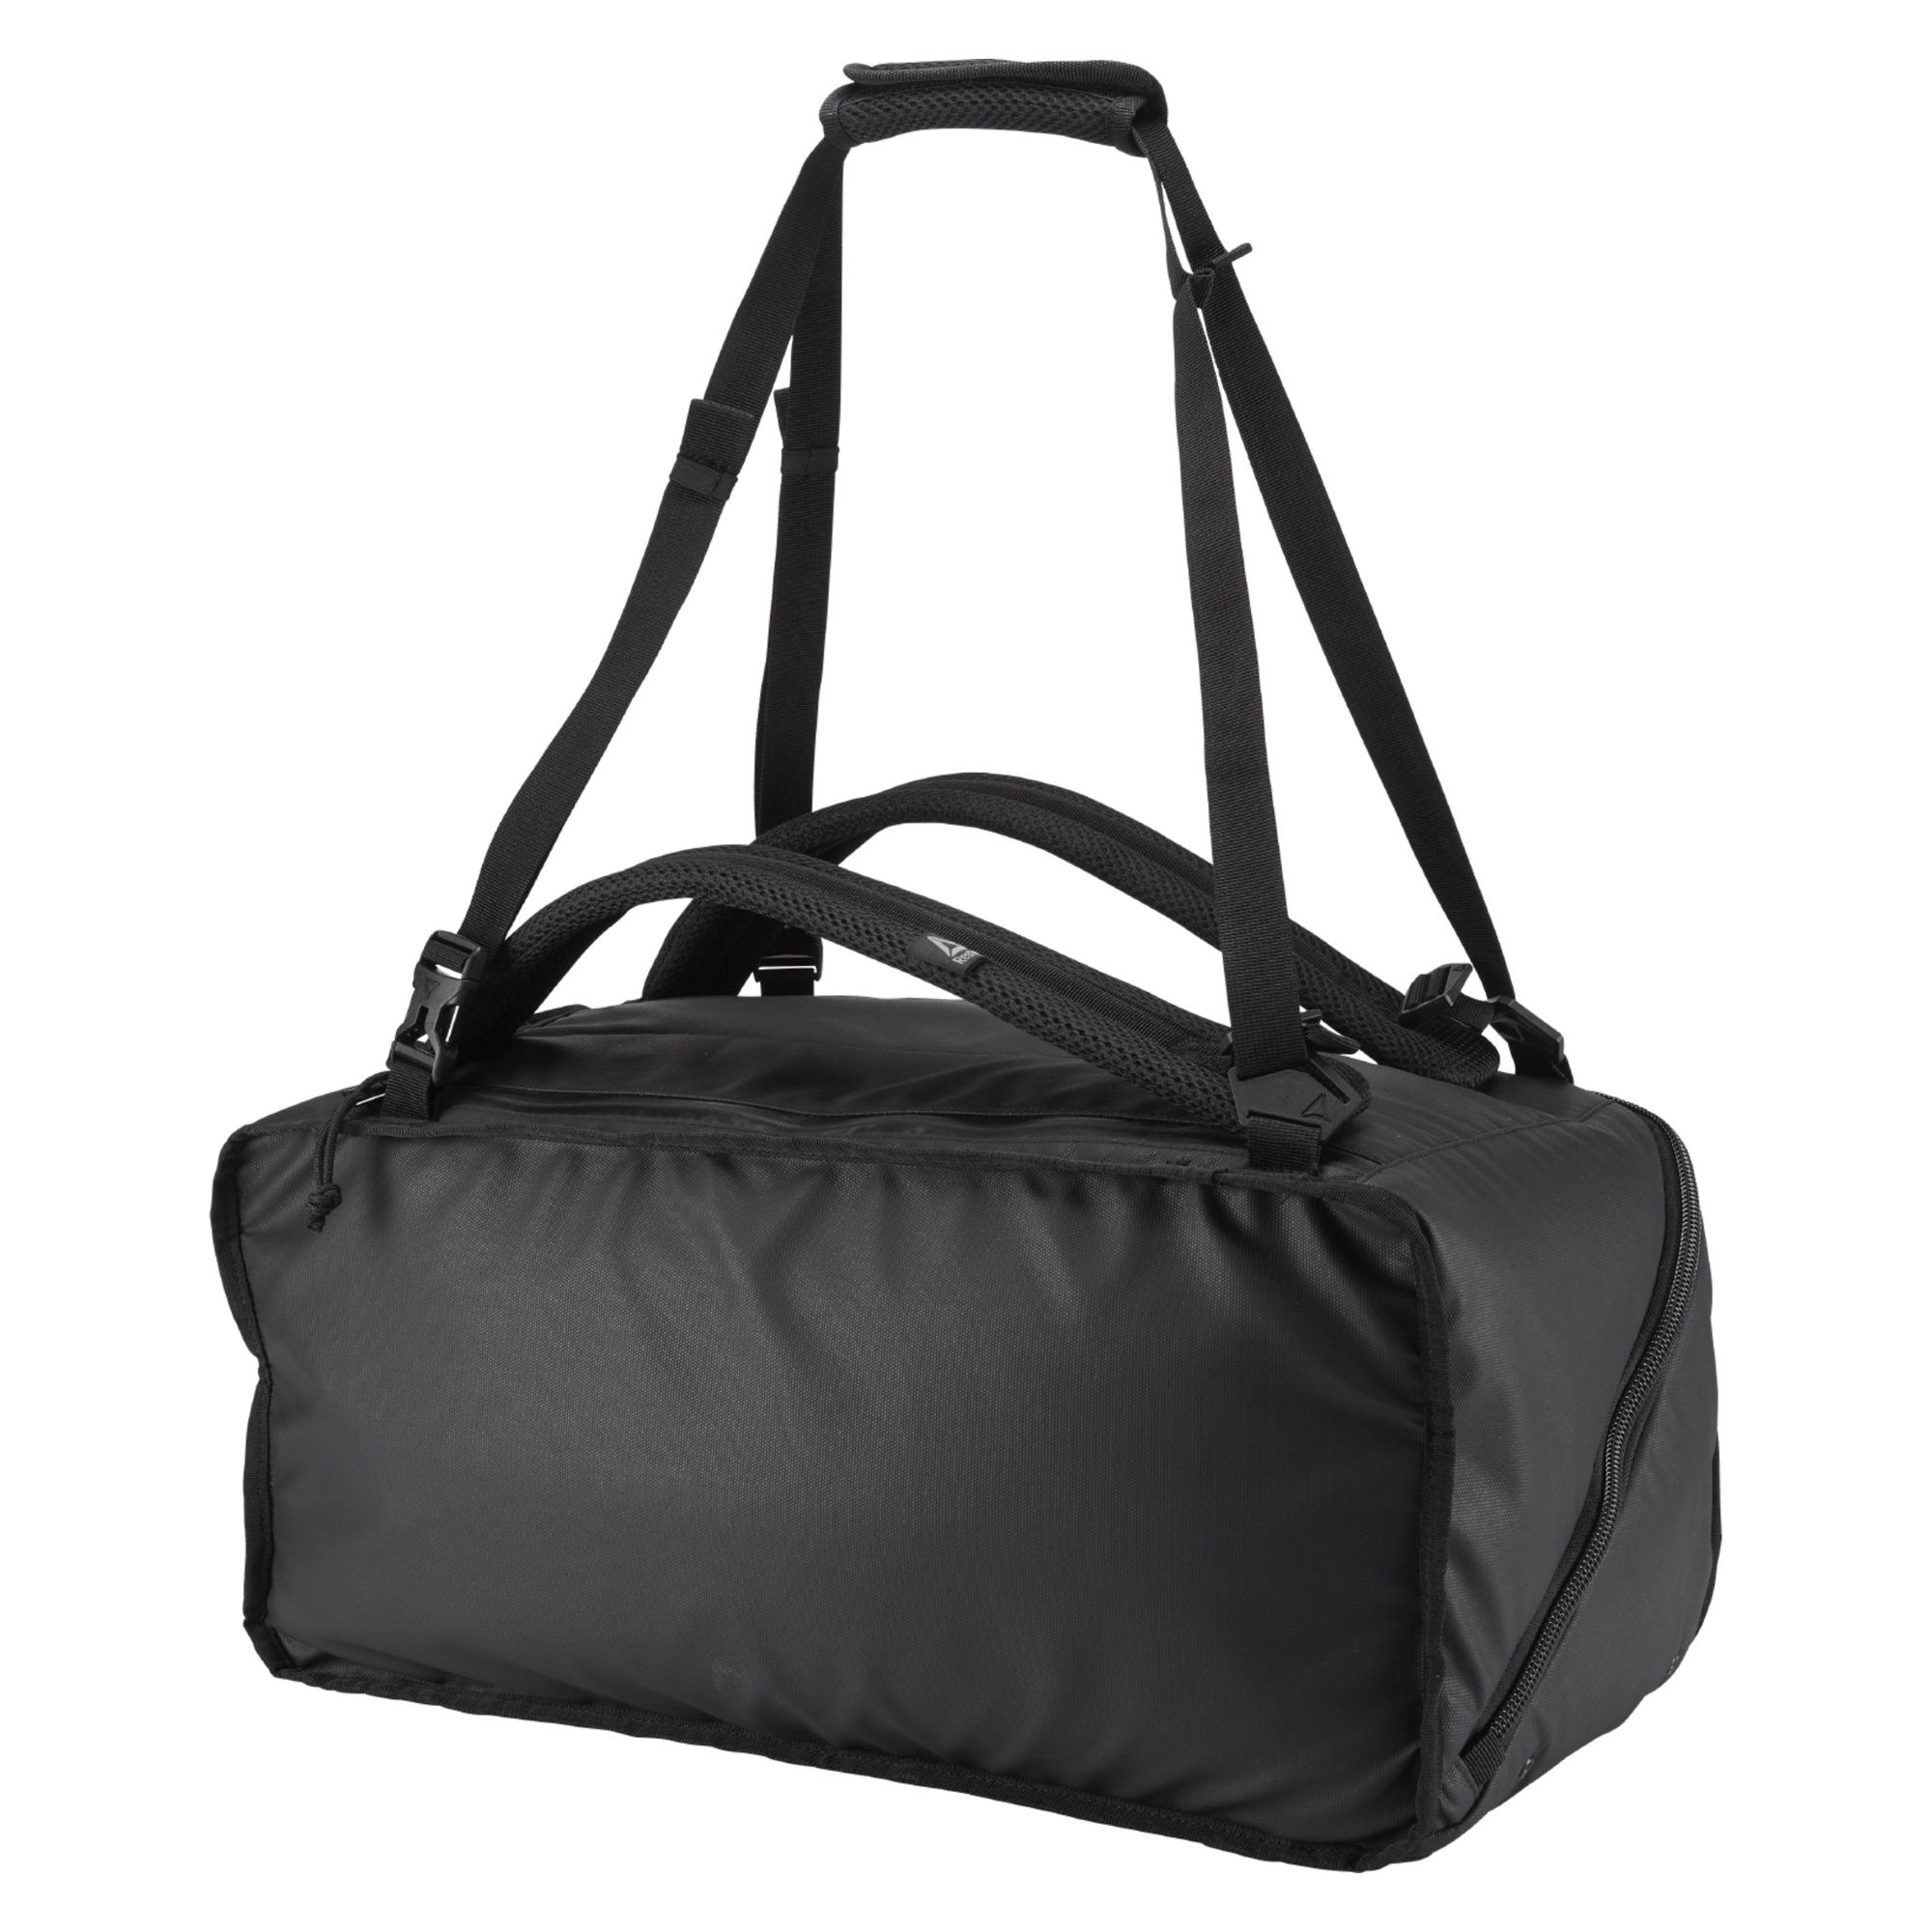 bbf9ebc29a58 Спортивная сумка-рюкзак Active Ultimate Convertible CZ9957 ...